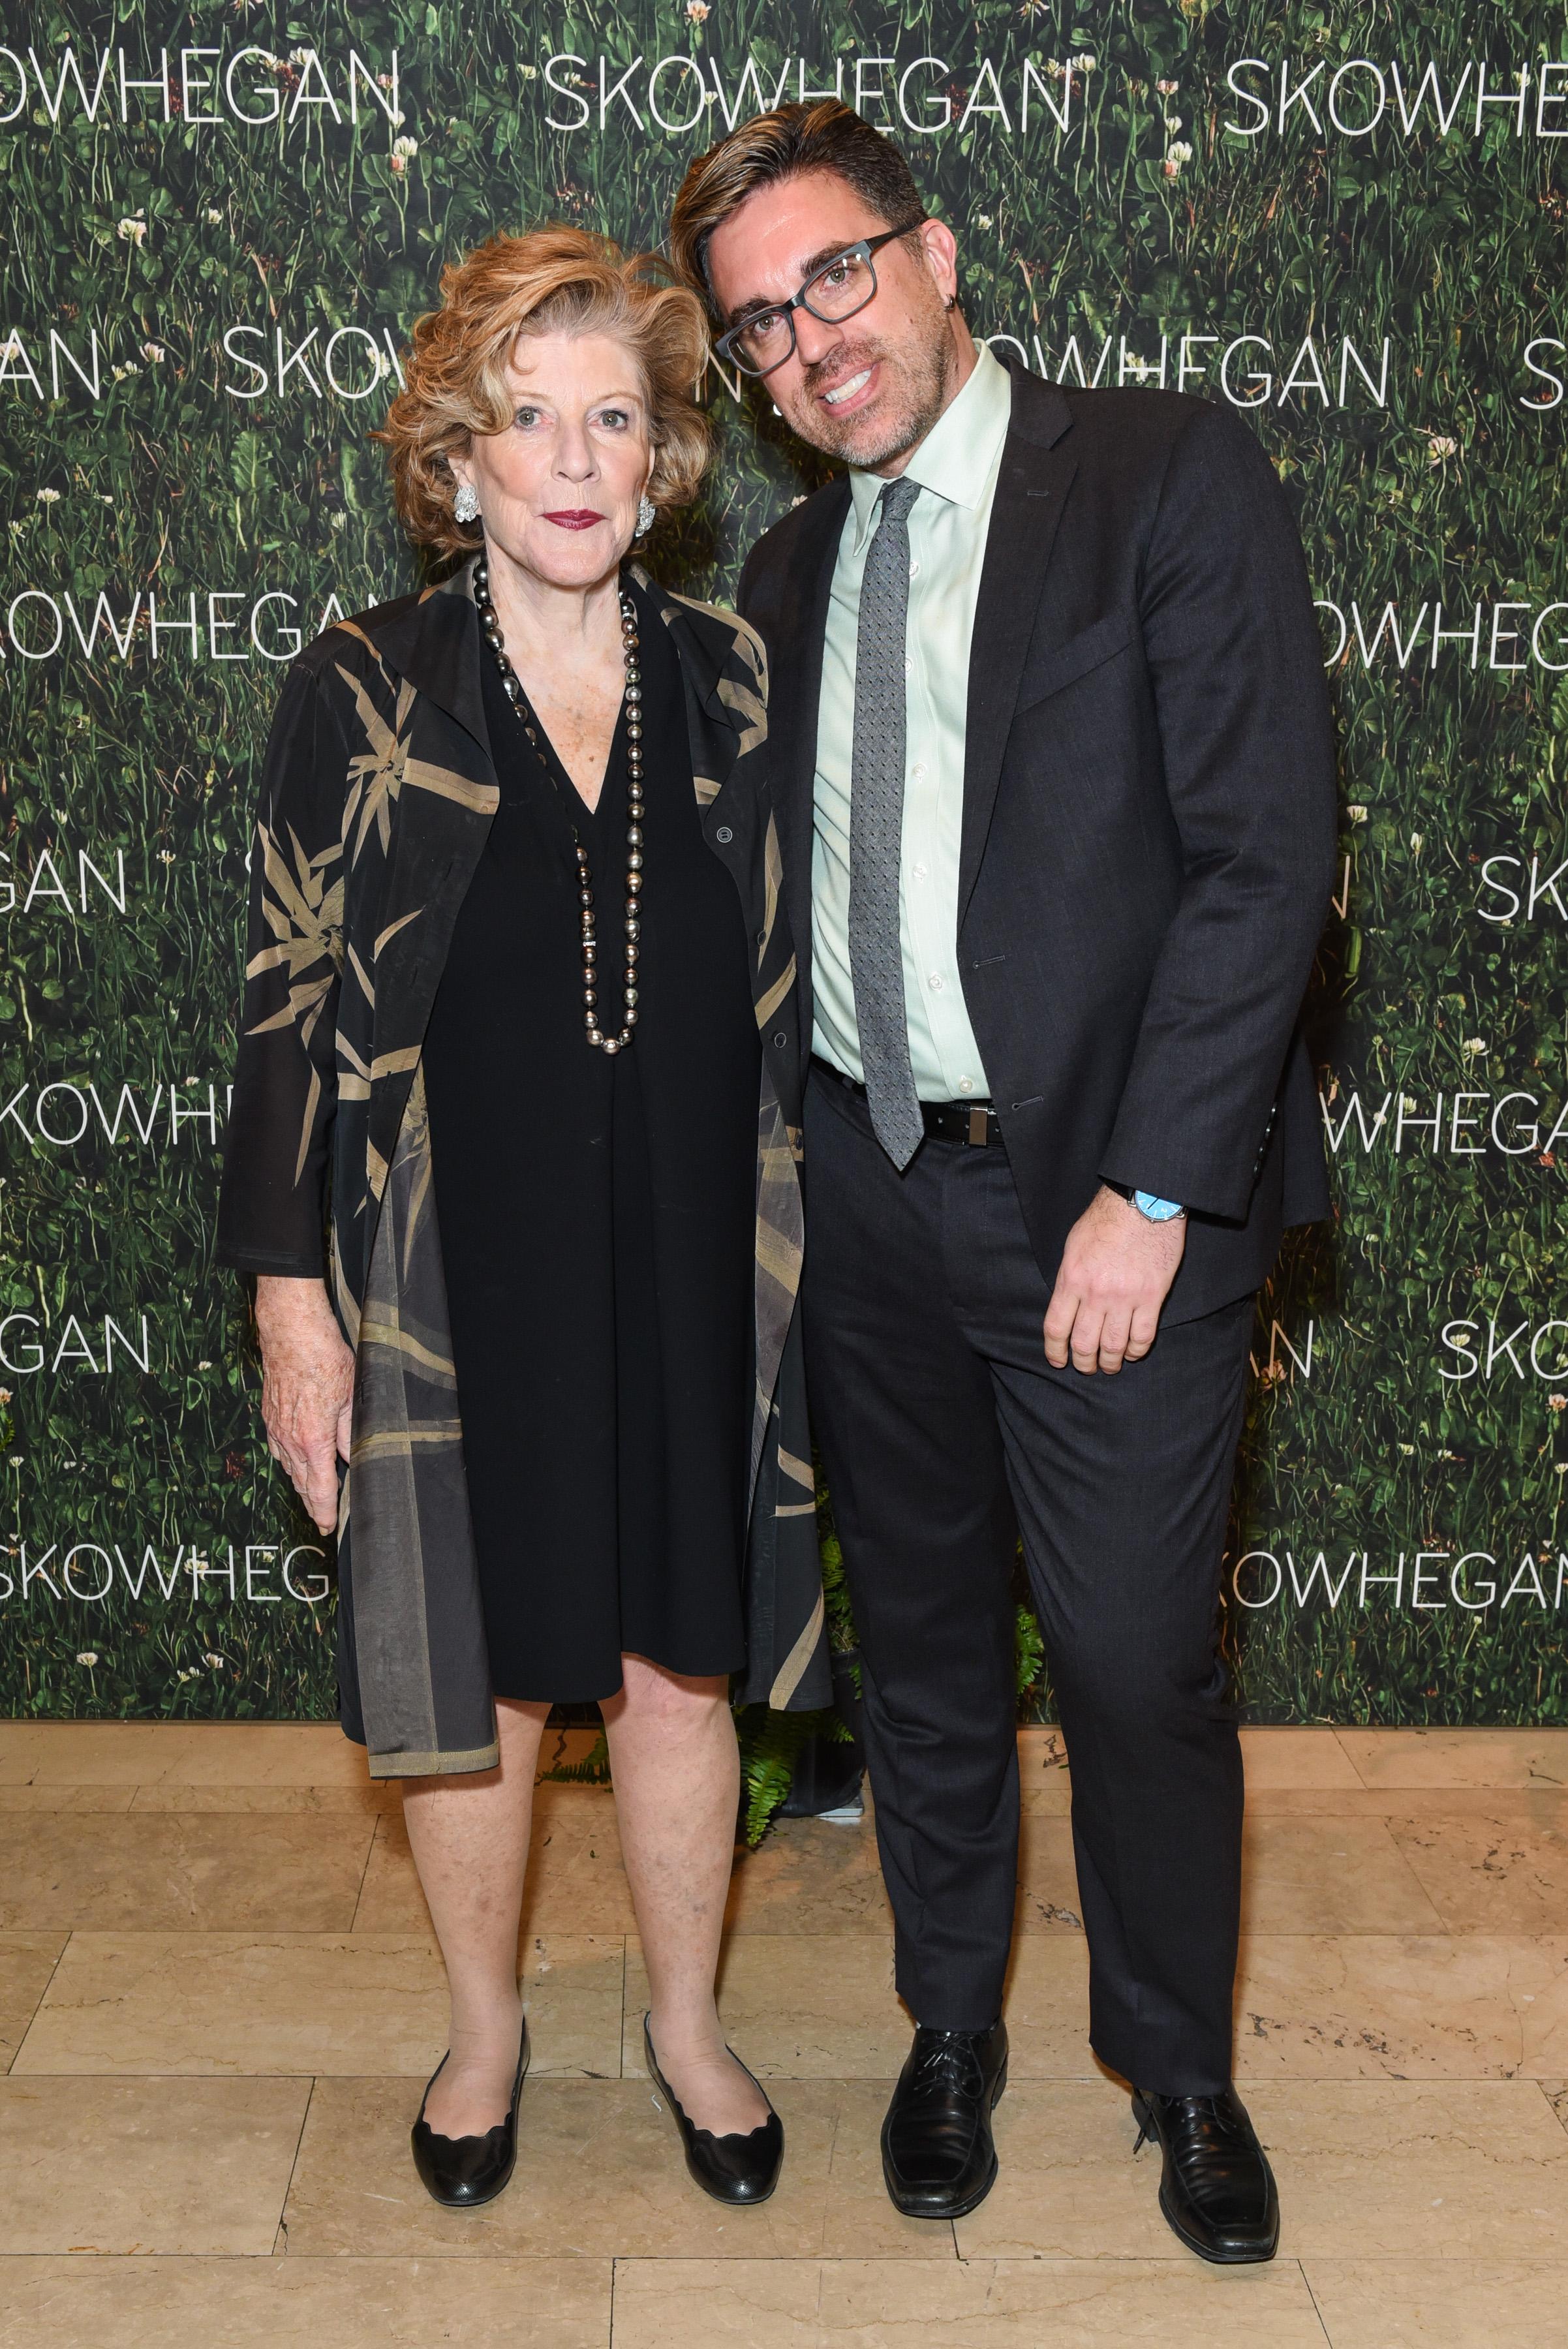 Agnes Gund, Jamie Bennett==Skowhegan Awards Dinner 2018==The Plaza Hotel, New York, NY==April 24, 2018==�Patrick McMullan==Photo - Presley Ann/PMC====